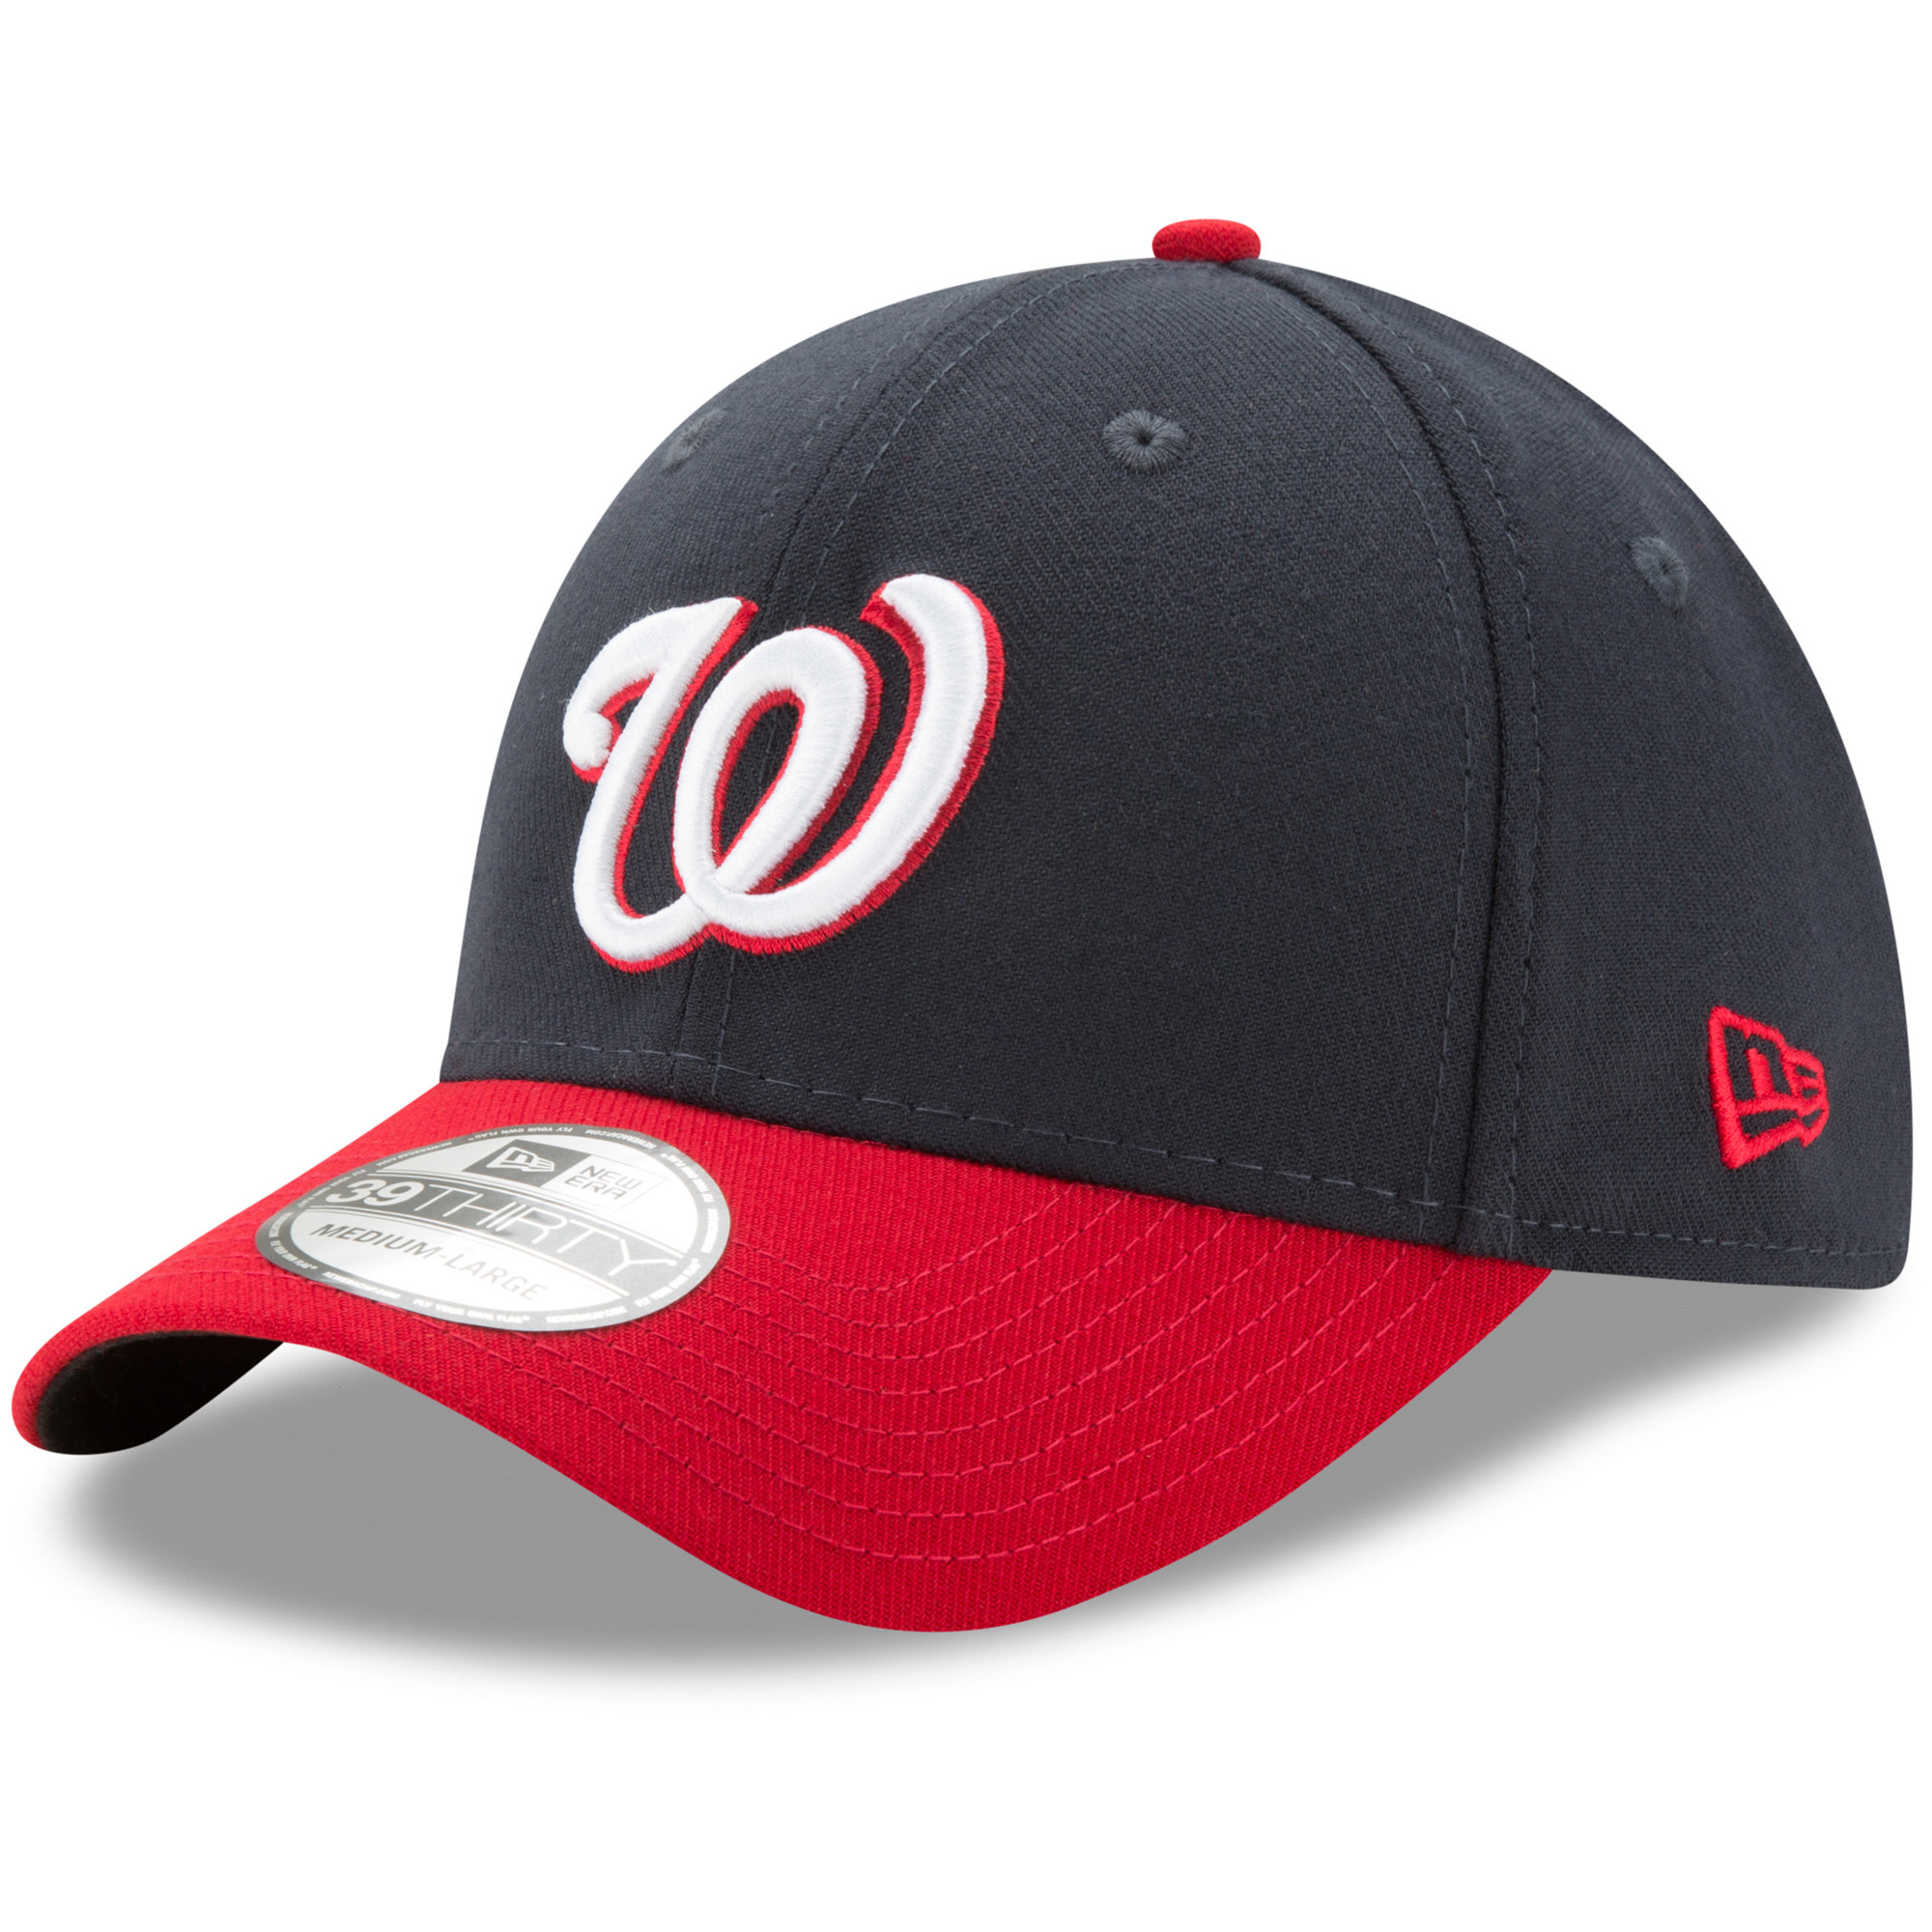 f097e85d1 spain washington nationals new era mlb fashion classic 39thirty cap ...